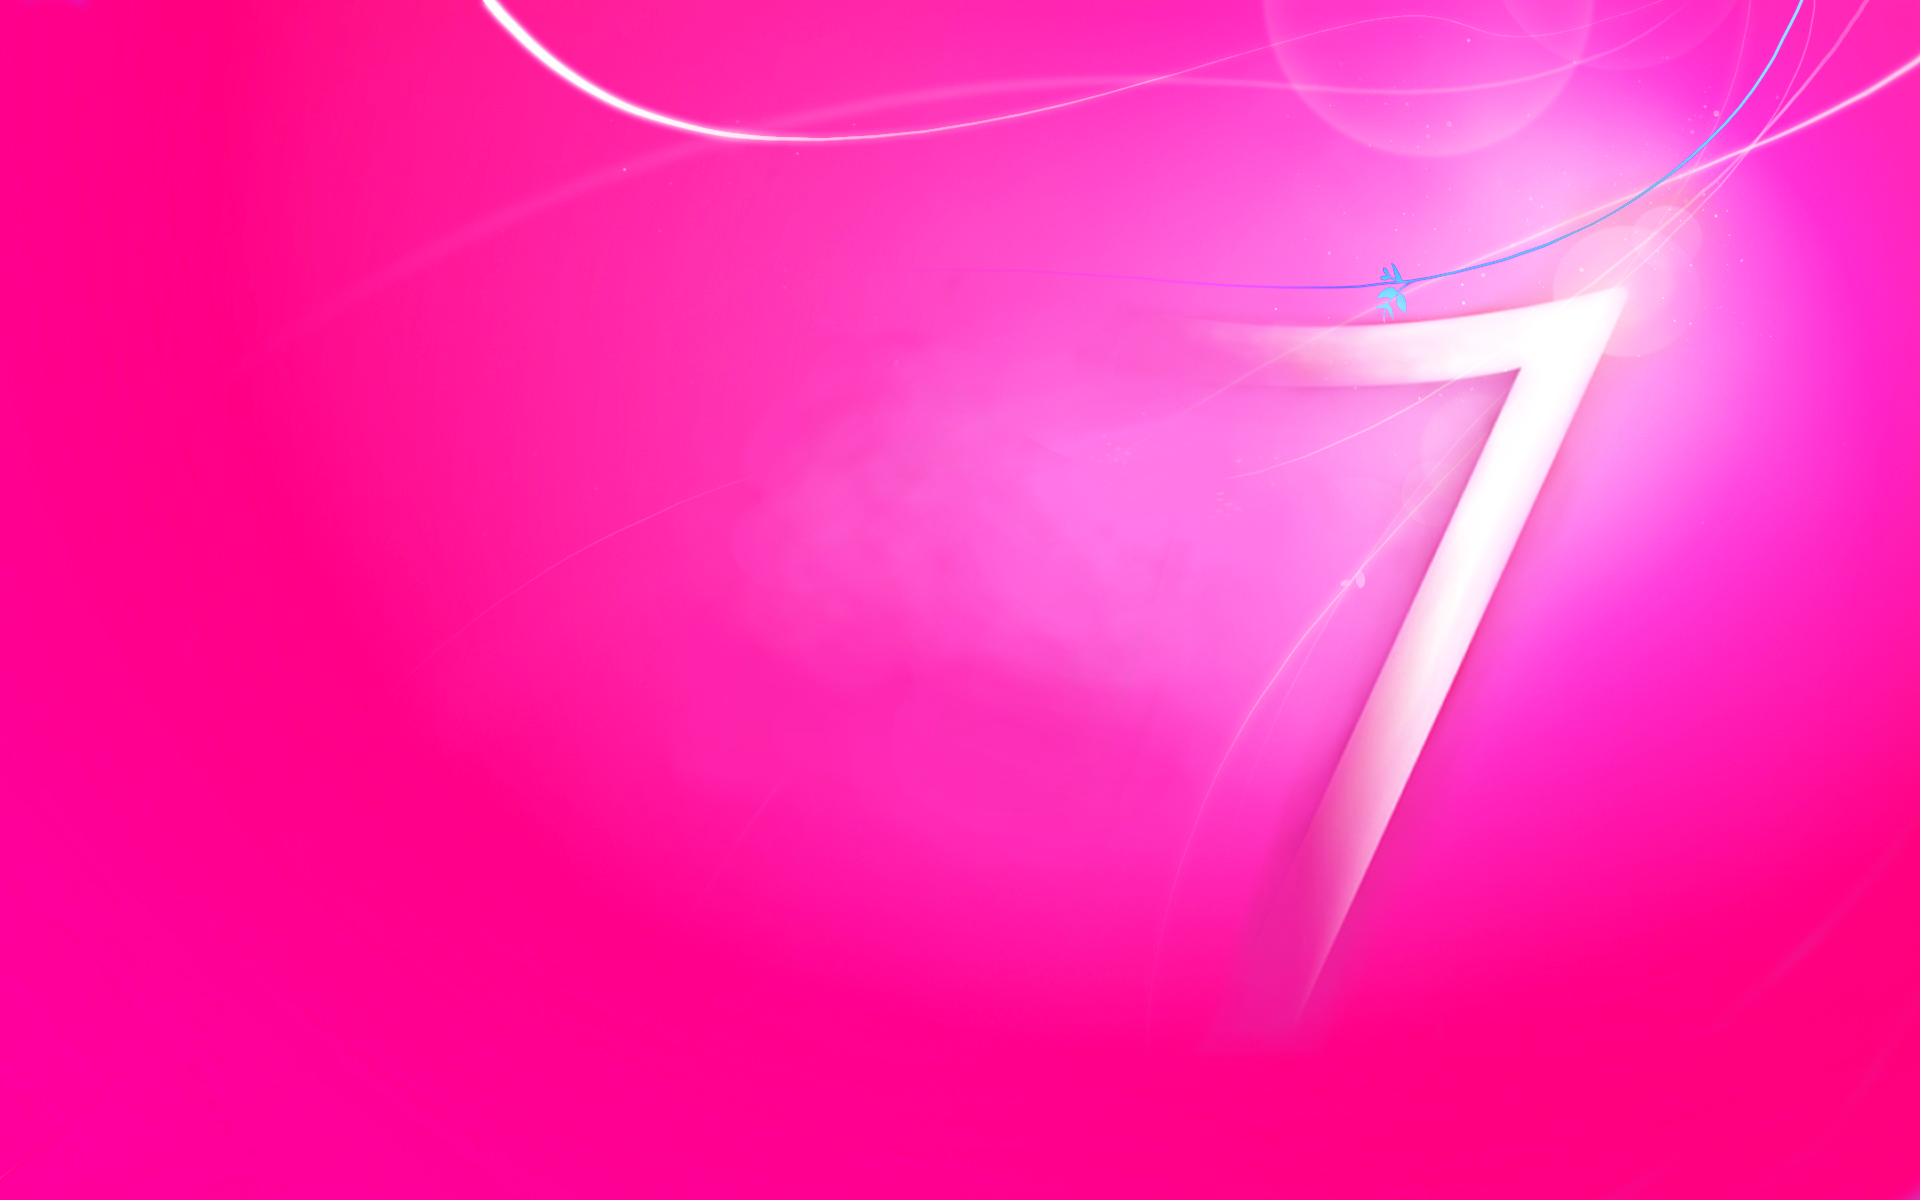 hp wallpaper pink - photo #36